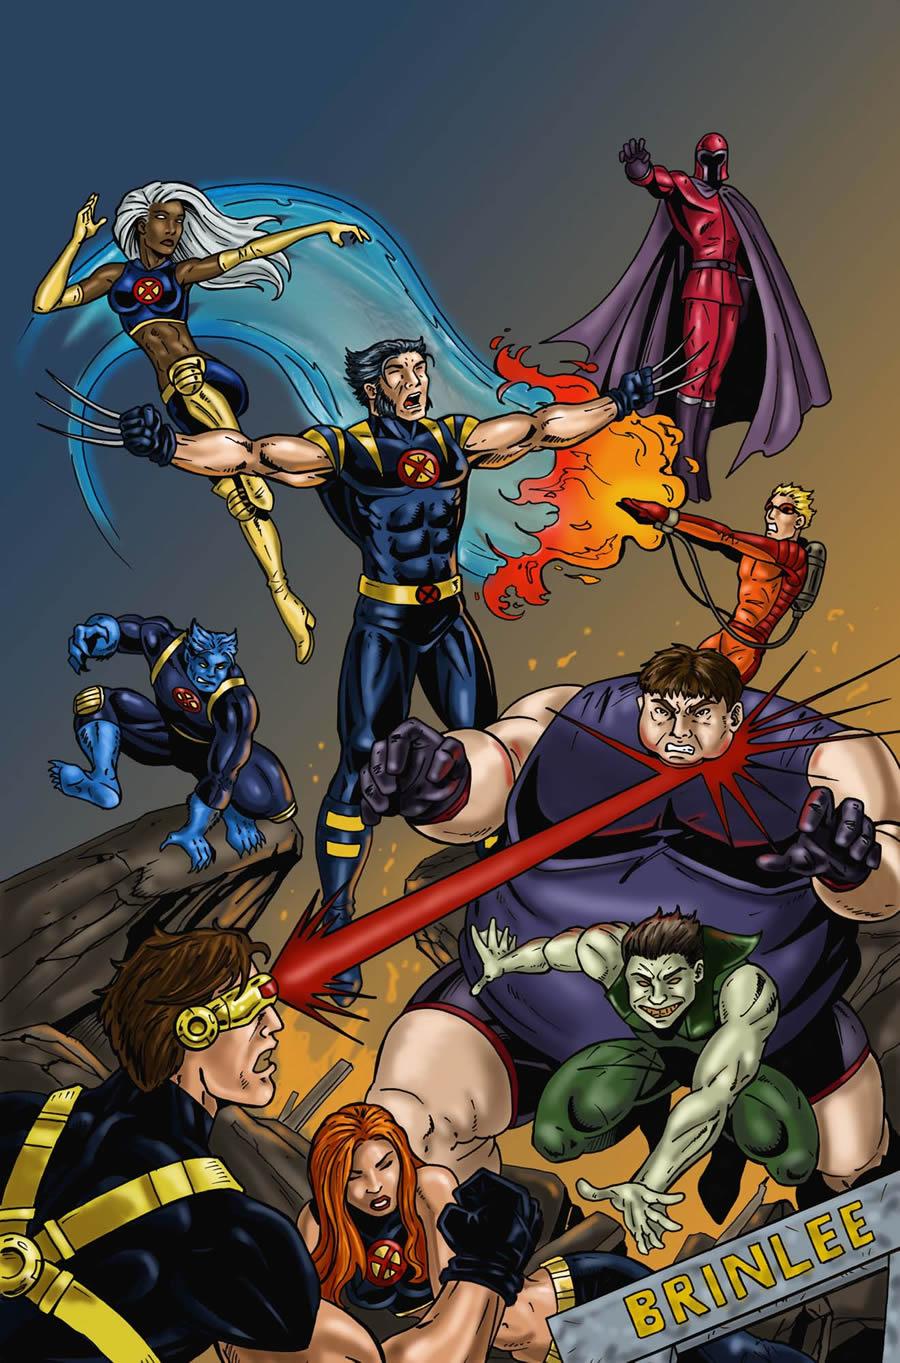 X Men Supreme Panel 4 By Slickboy444 On Deviantart